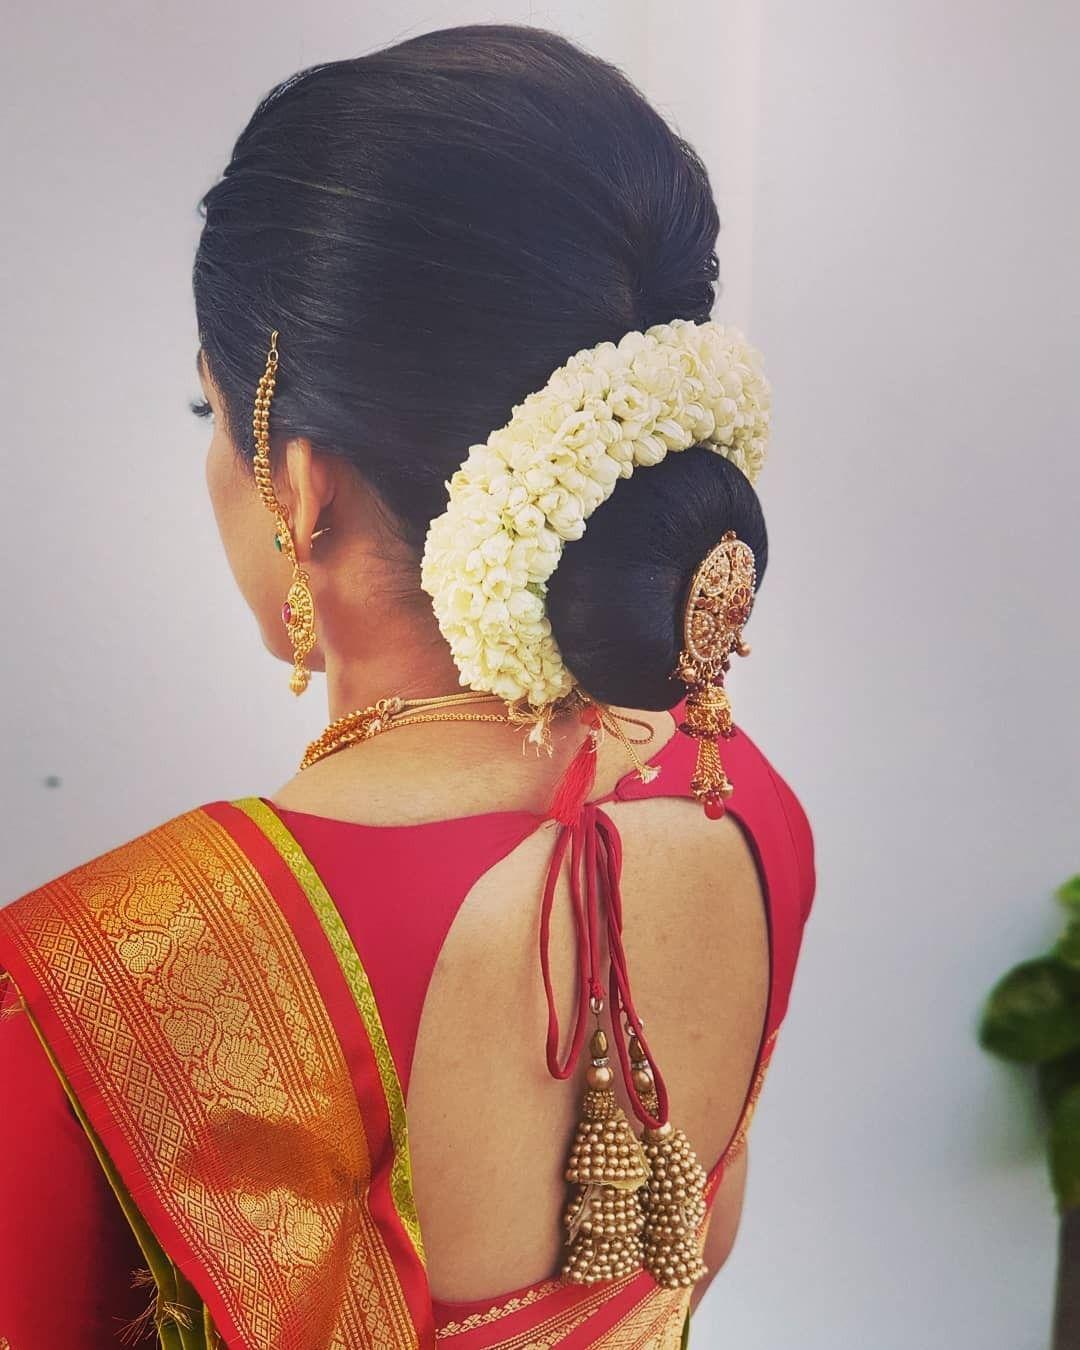 Pin By Thibahtarusini Arumugam On Hair Trends Bridal Hair Buns Indian Hairstyles Big Bun Hair